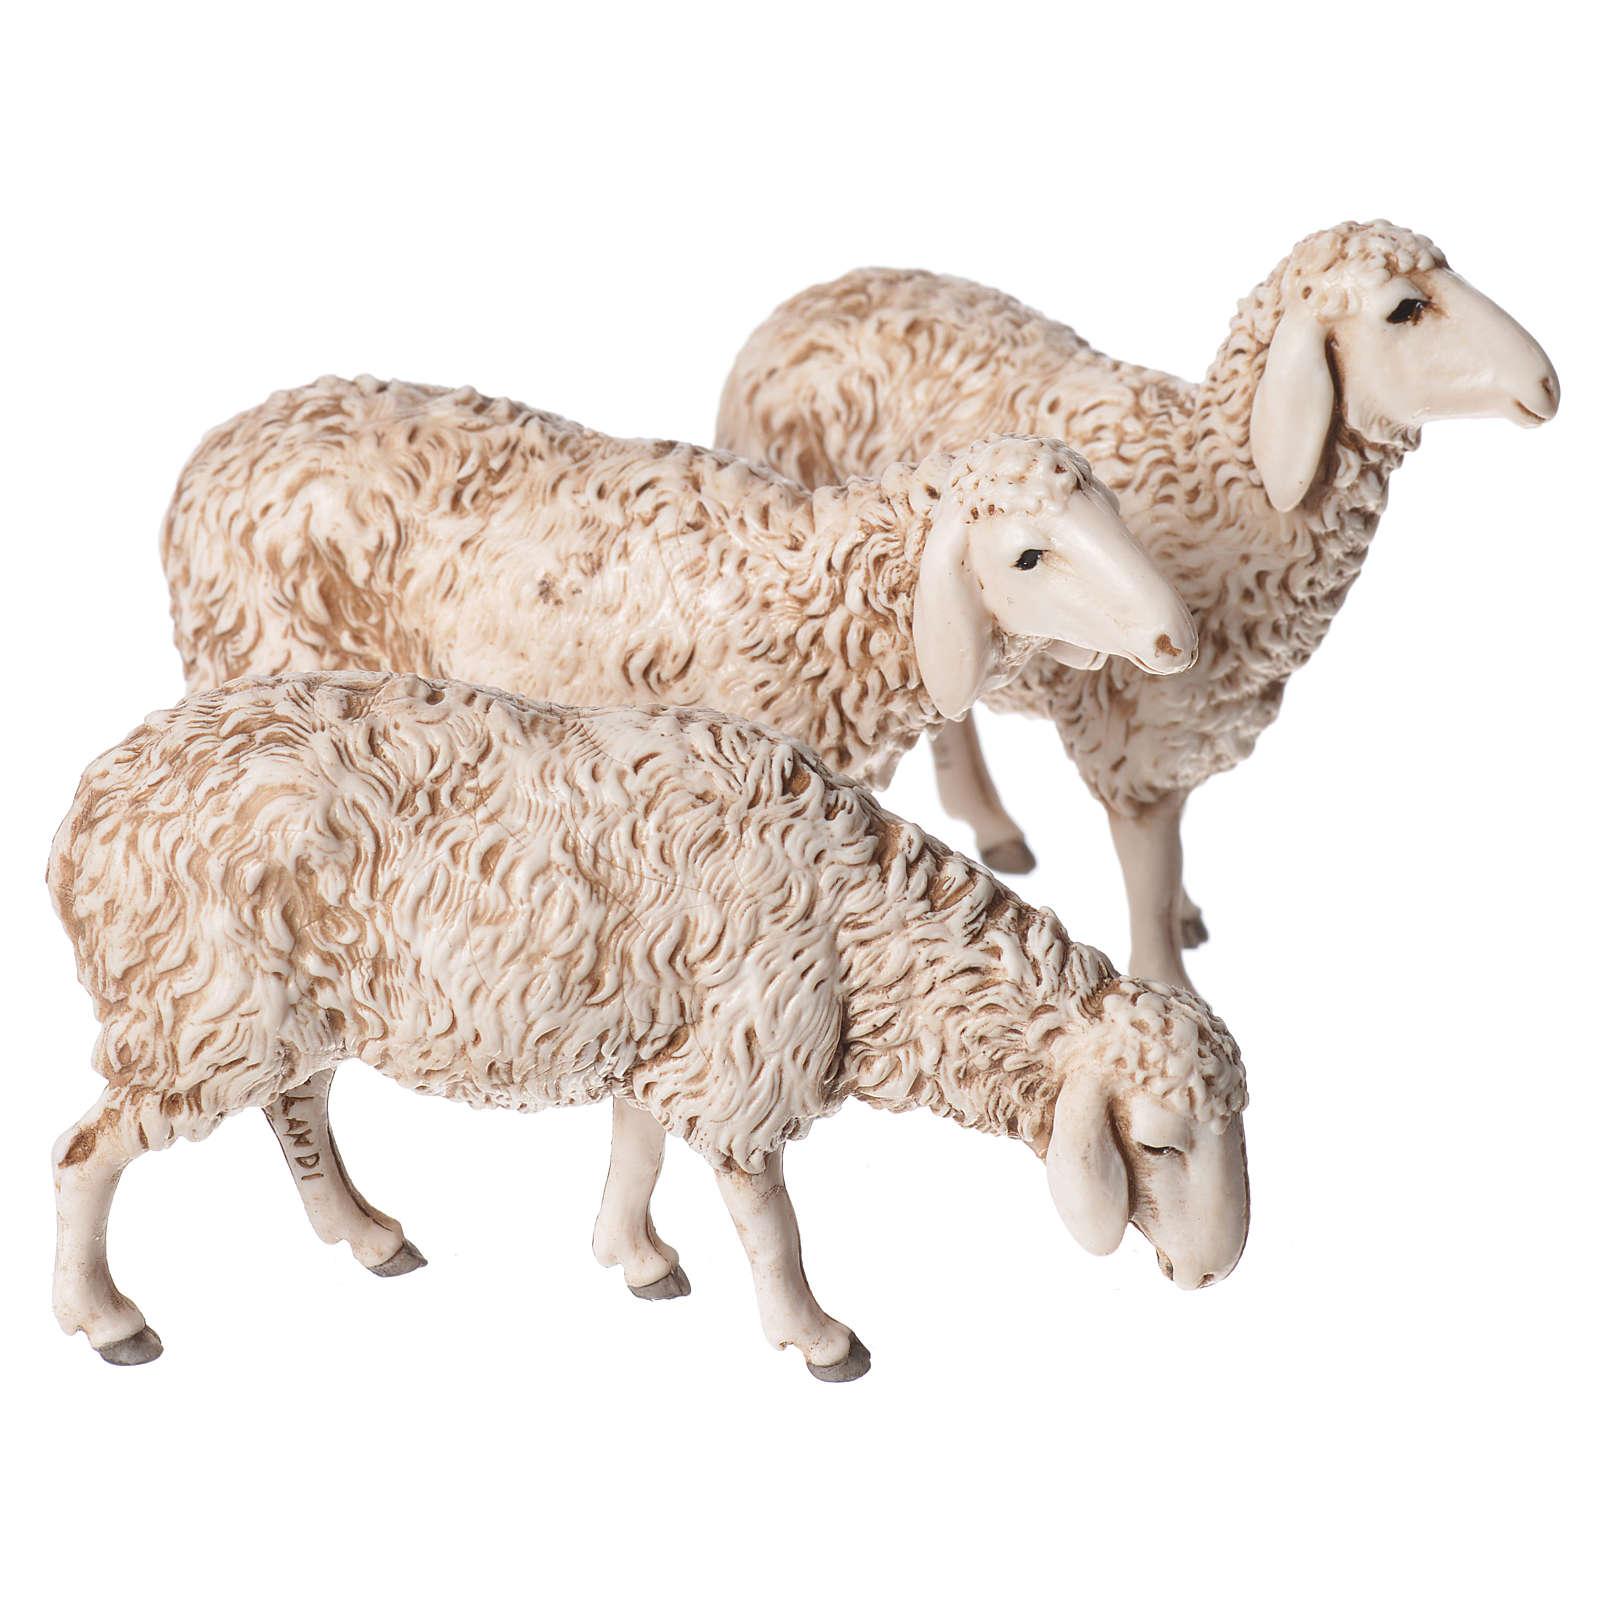 Pecore, capra e cane cm 13 Moranduzzo 6 pz 4